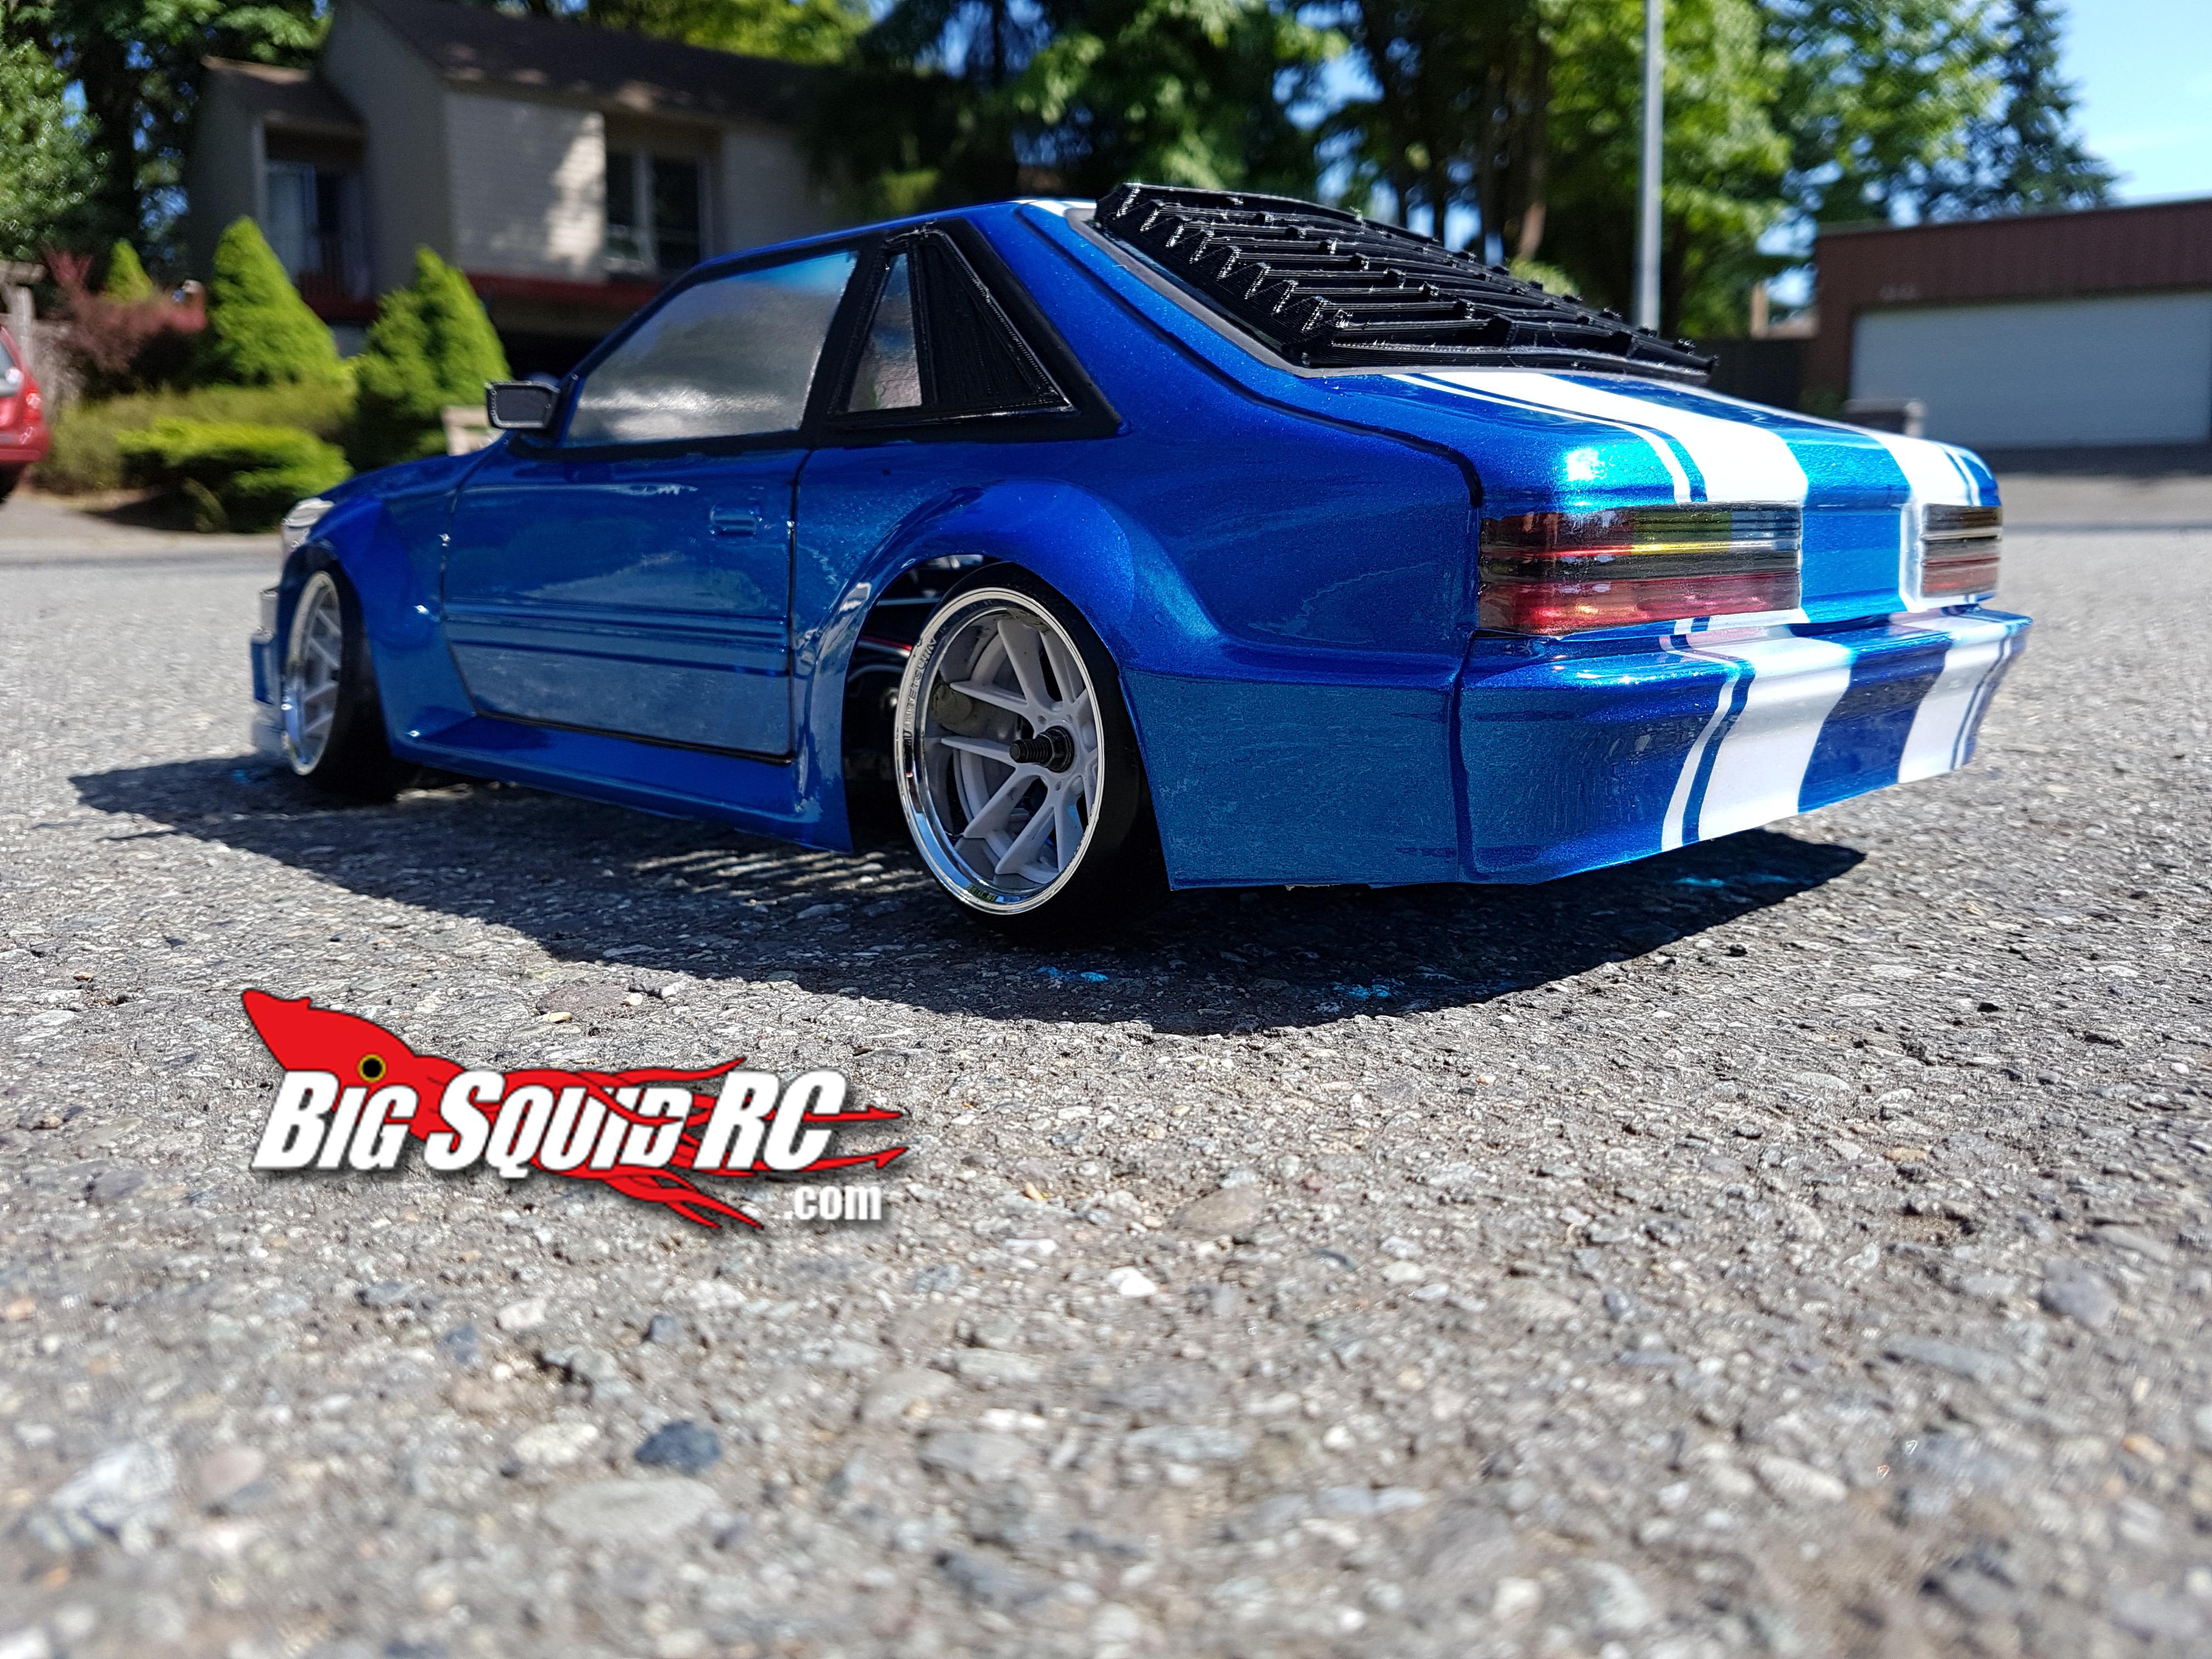 Cobra Kit Car >> APlastics H.C.W.B 5.0 and EXCLUSIVE R/C Body Kit Review ...